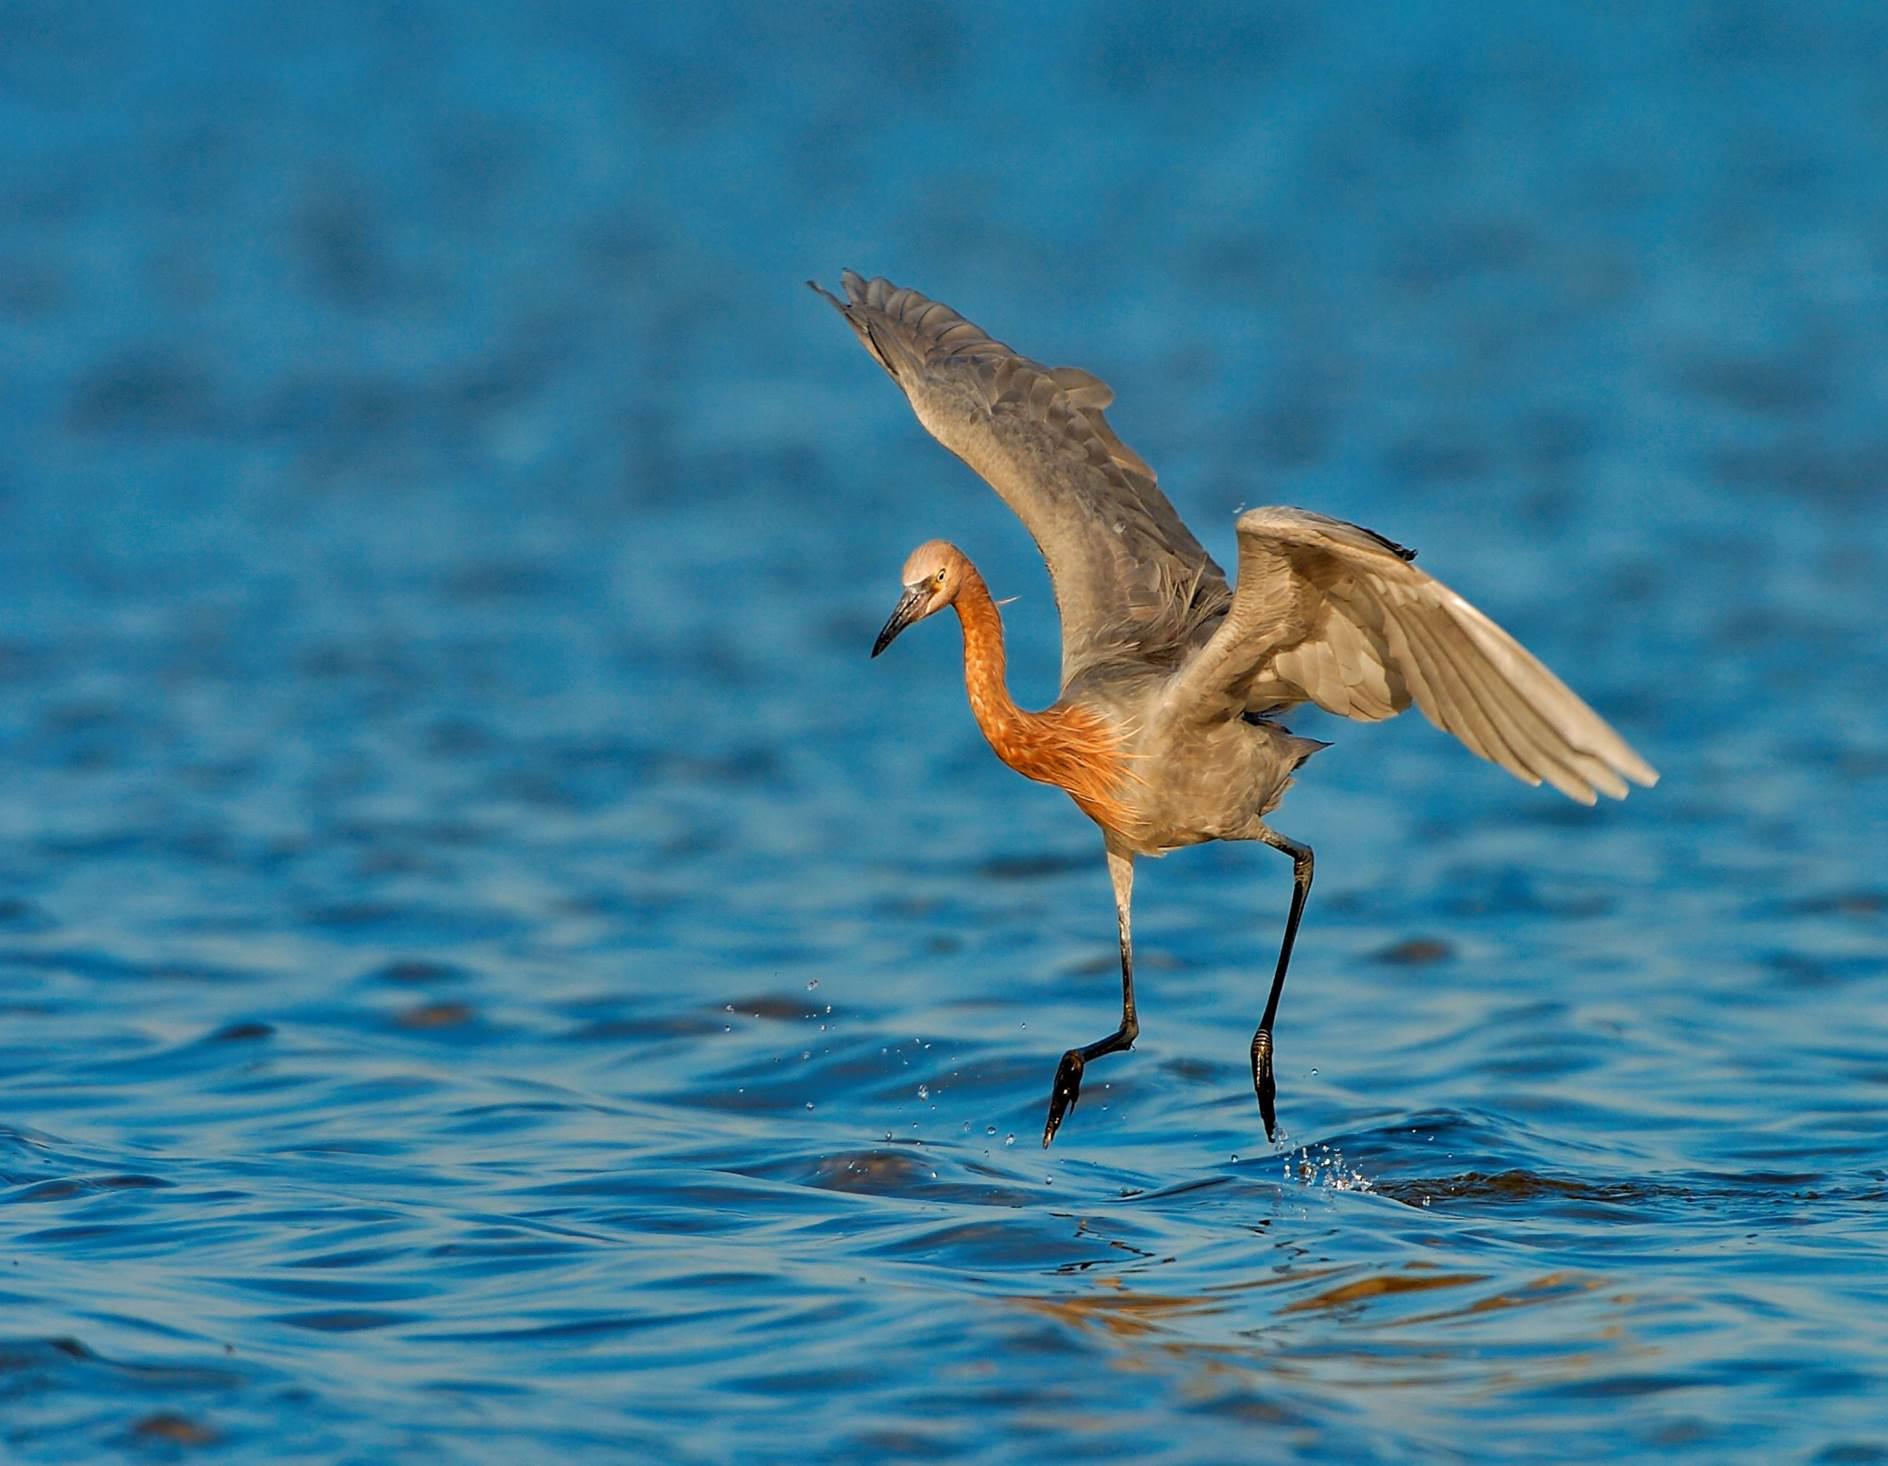 Bird landing on water